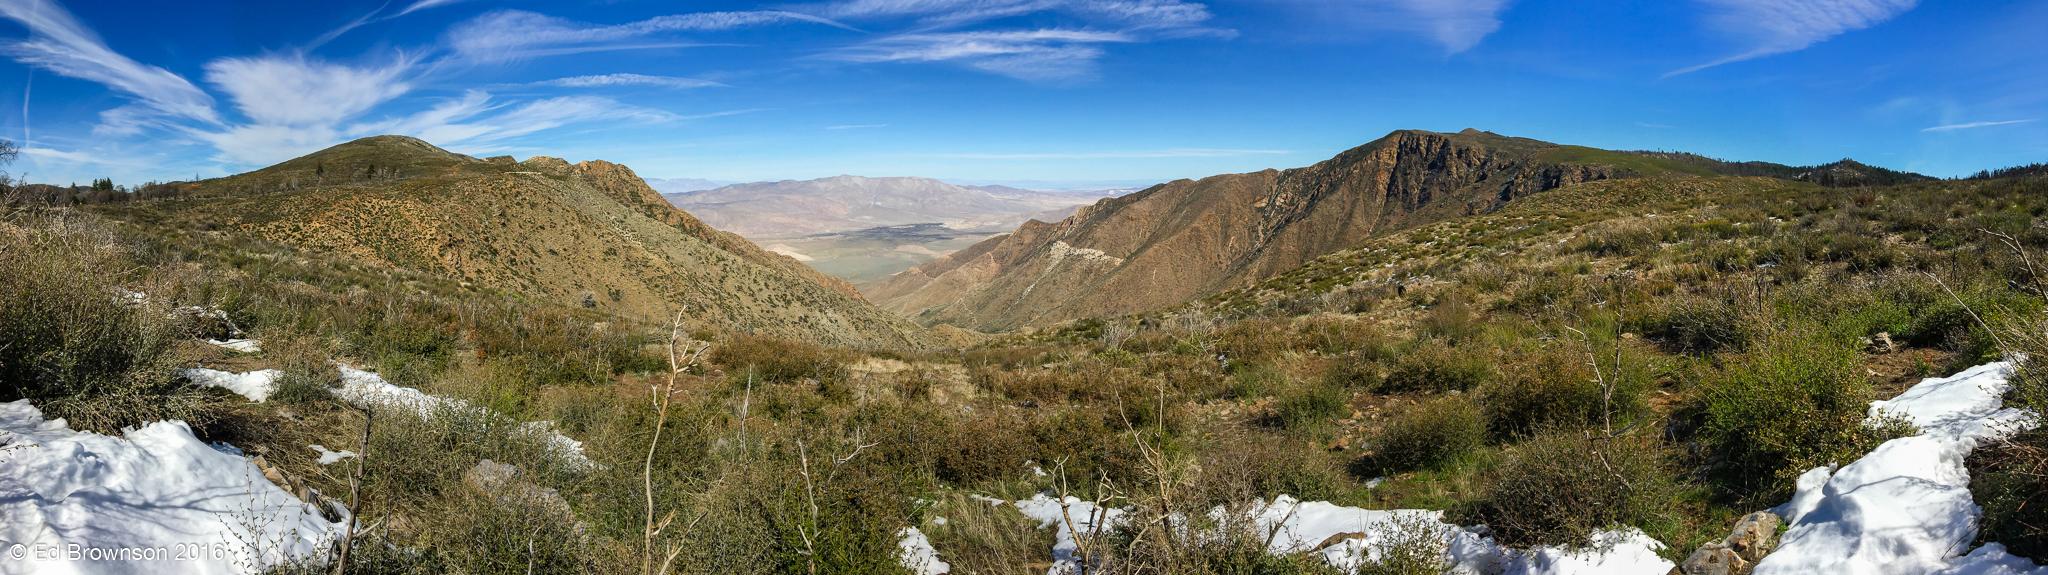 Elevation of Deer Creek Trail, Pine Valley, CA, USA ...